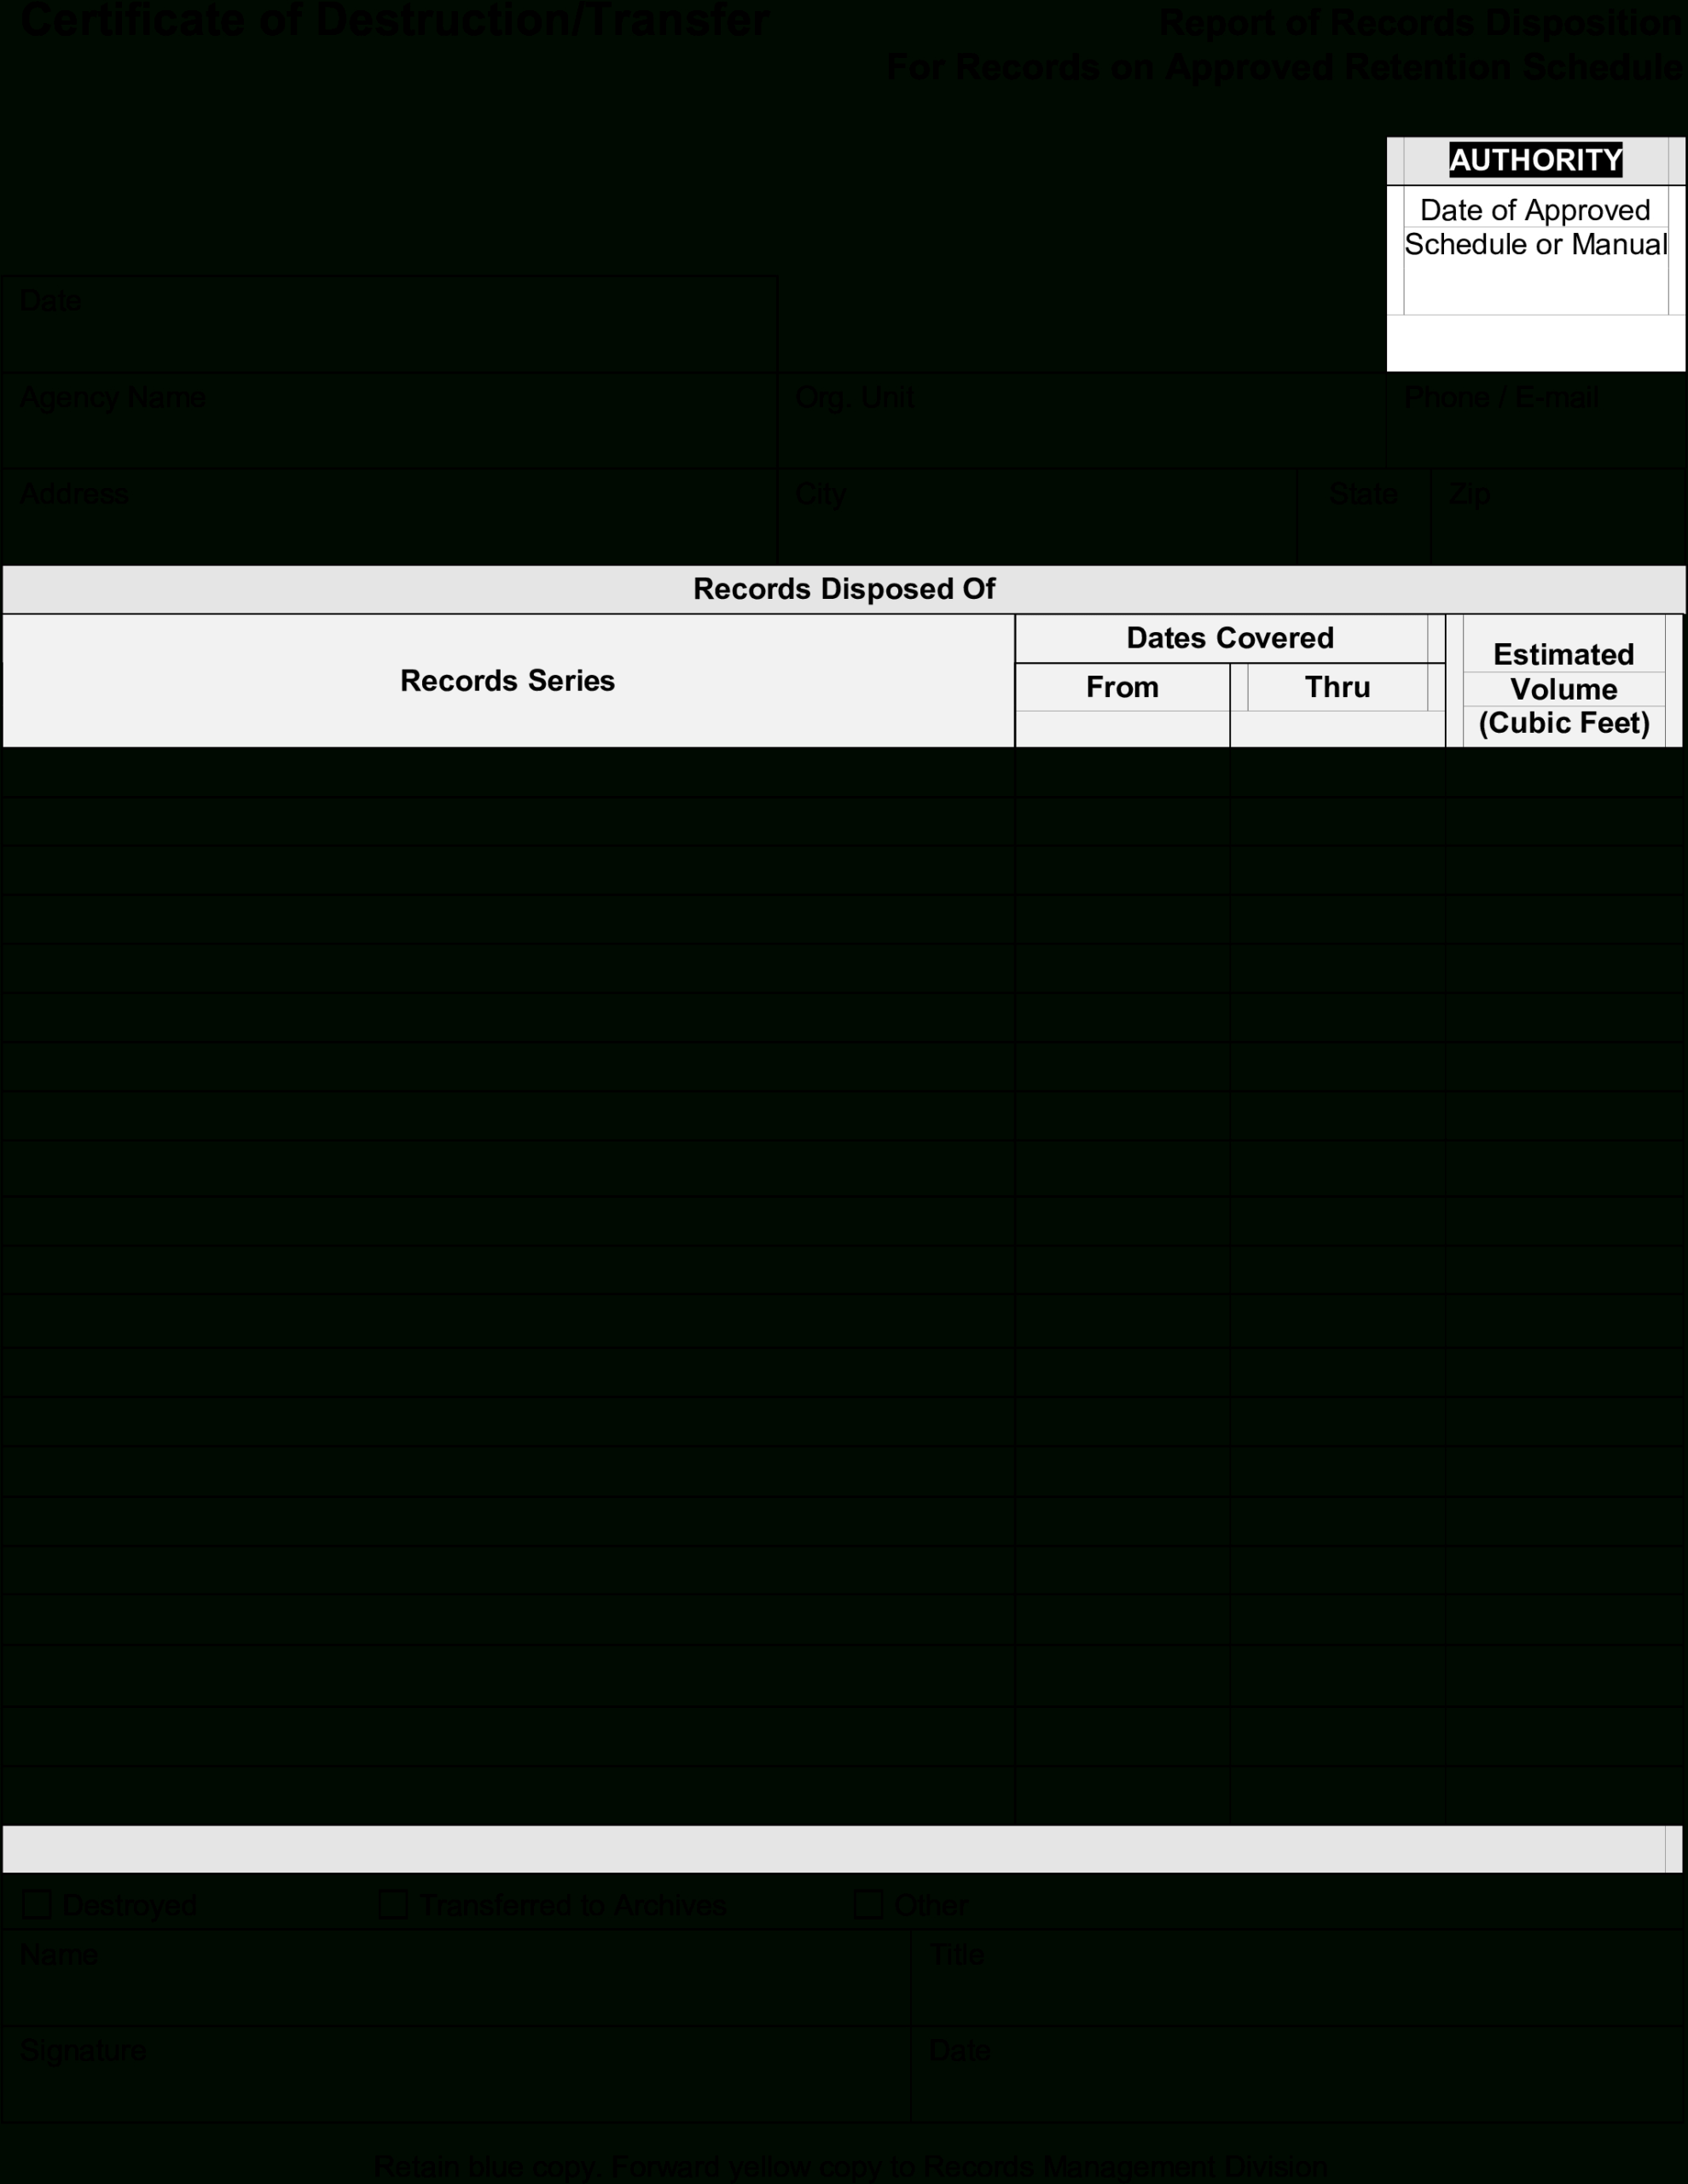 Blank Certificate Template Png – Blank Certificate Of Regarding Free Certificate Of Destruction Template